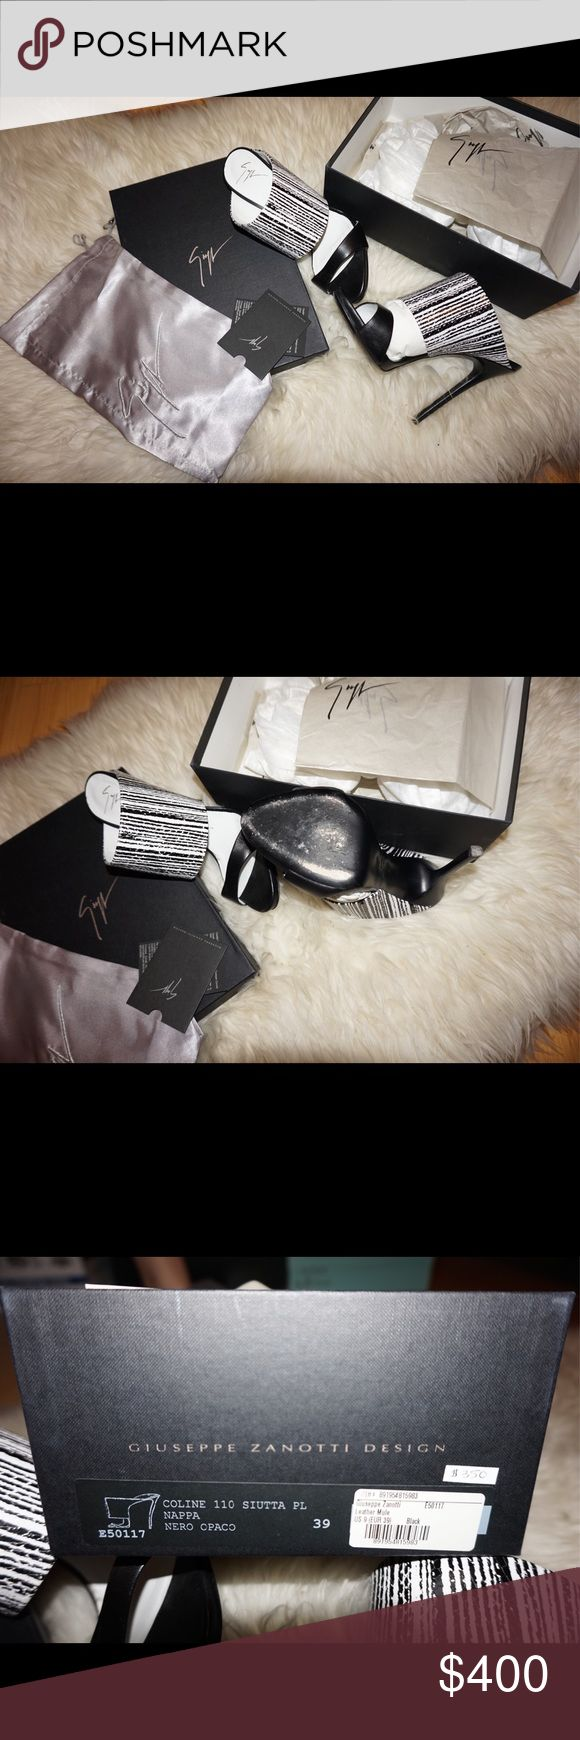 Giuseppe Zanotti Black White heels Worn Twice Giuseppe Zanotti heels 100% authentic comes with box Giuseppe Zanotti Shoes Heels #giuseppezanottiheelswhite